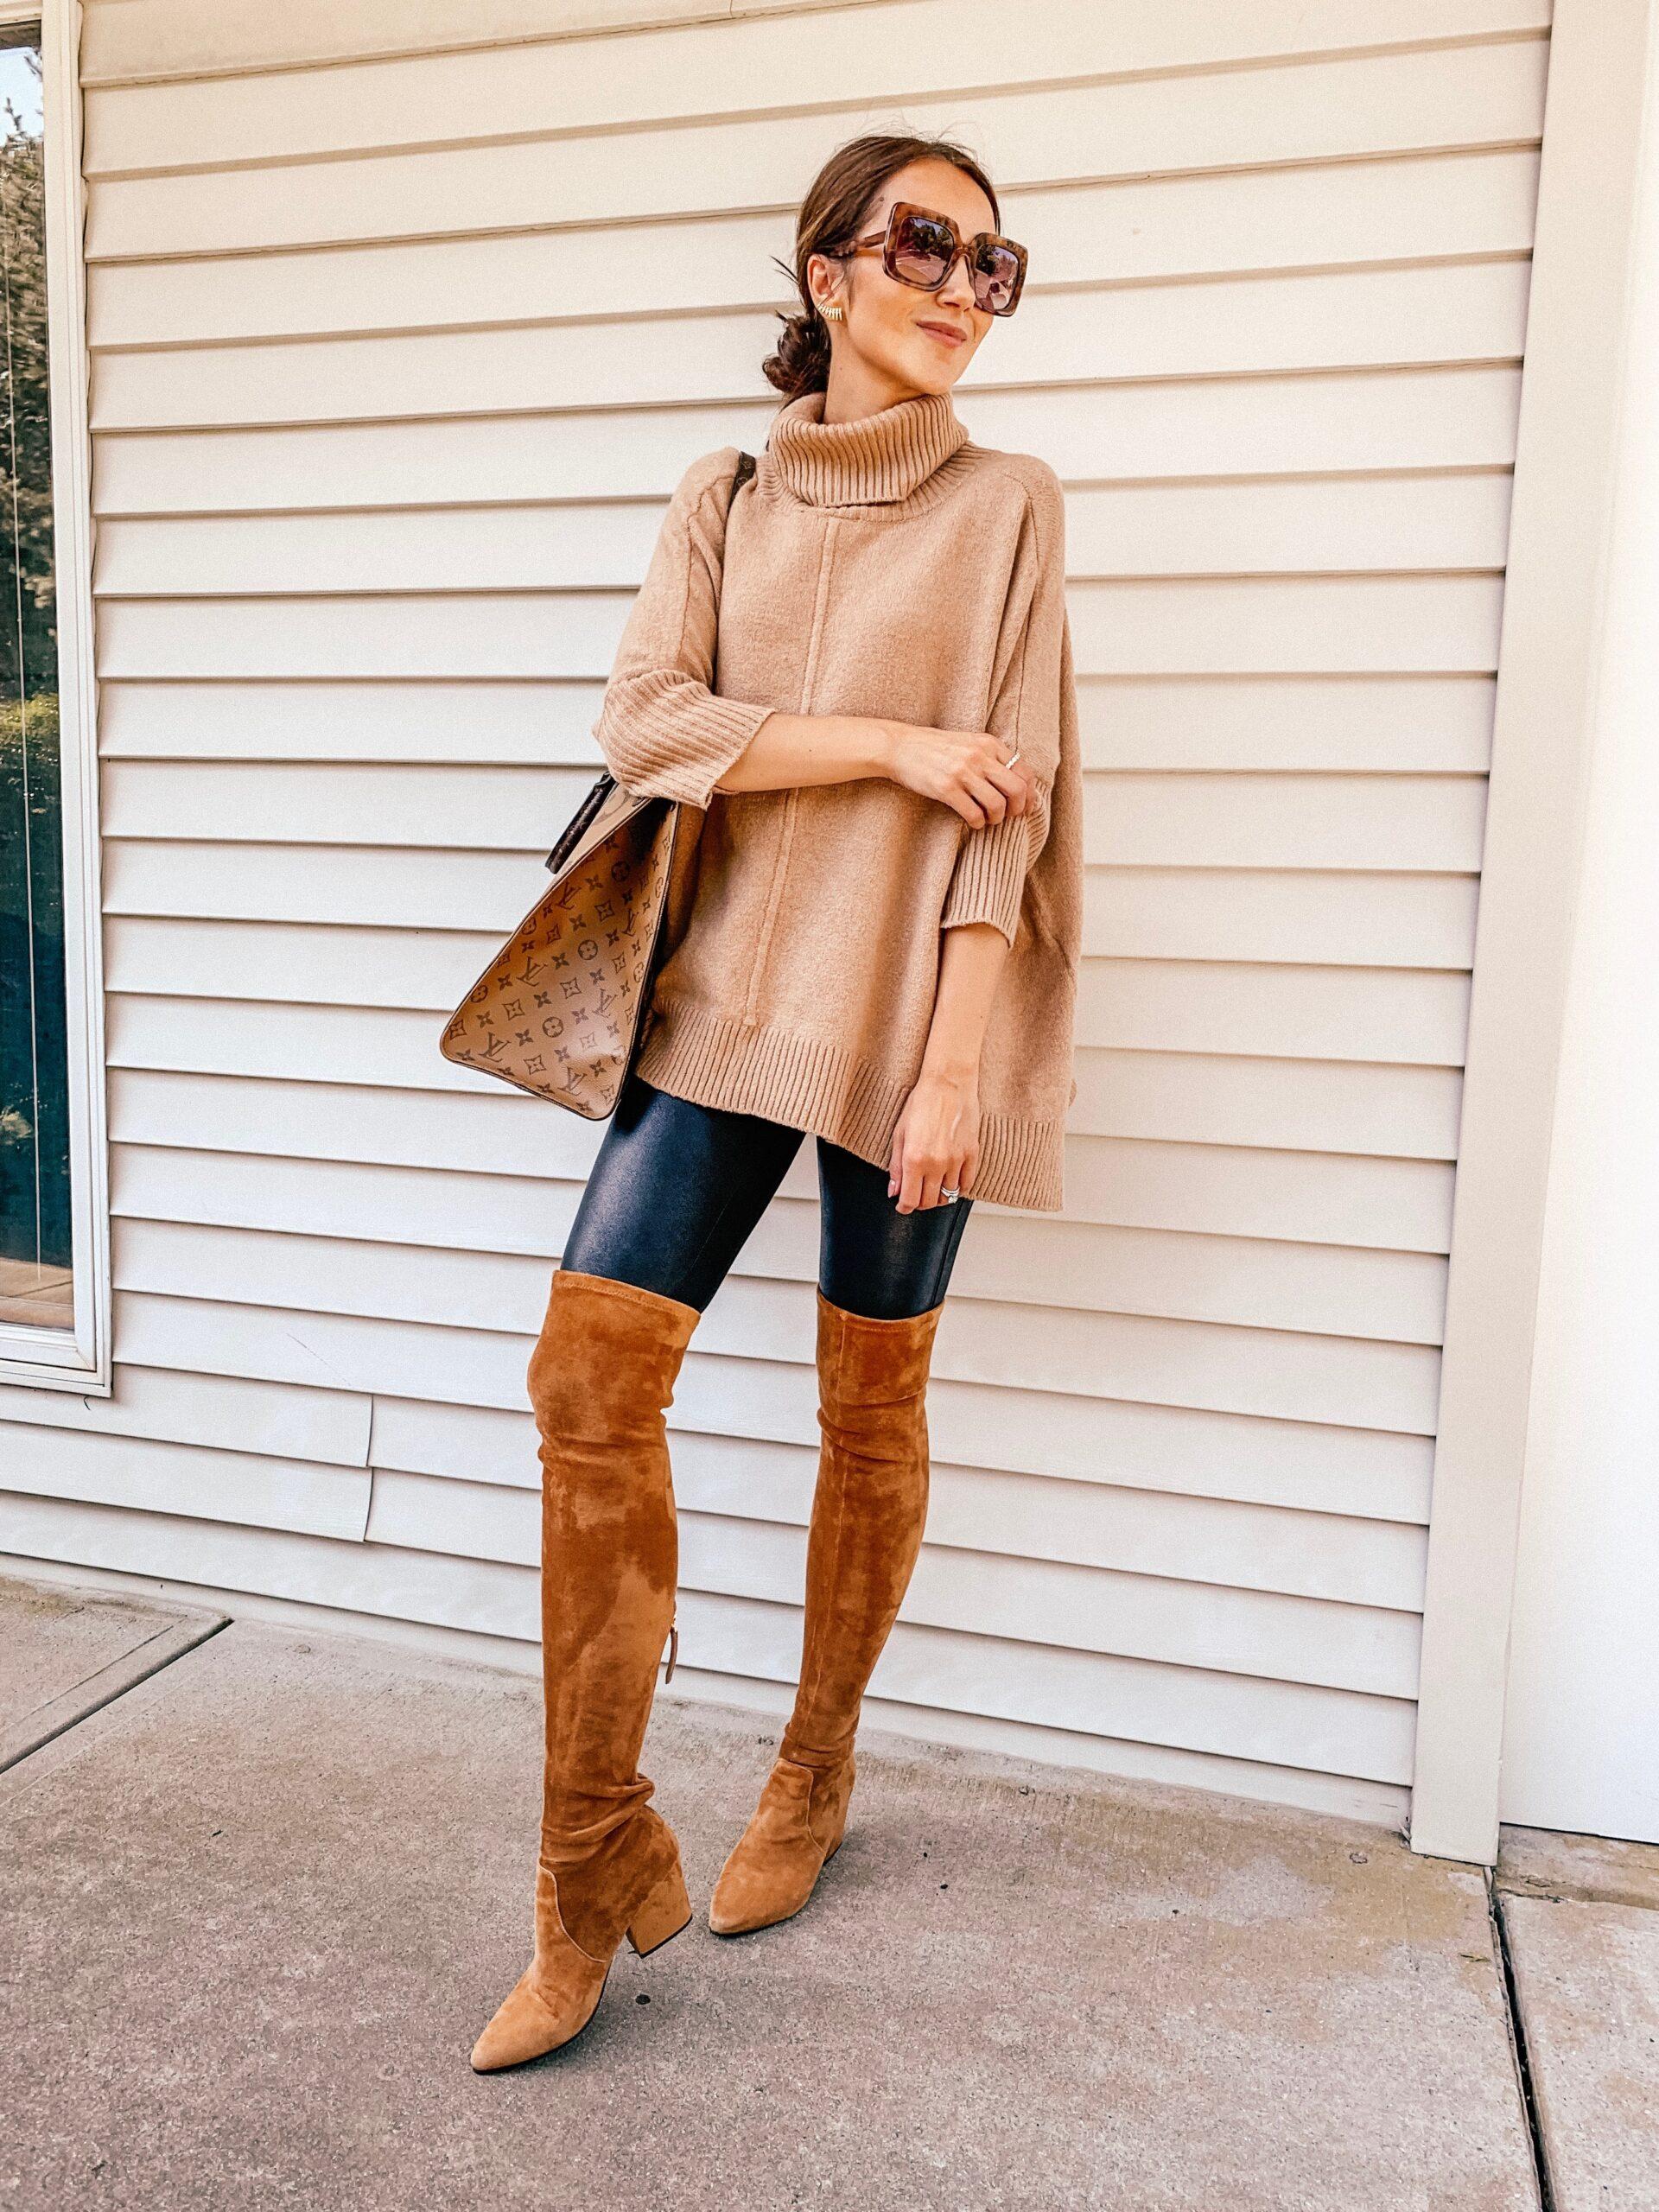 Outfits for leggings, spanx leggings, poncho